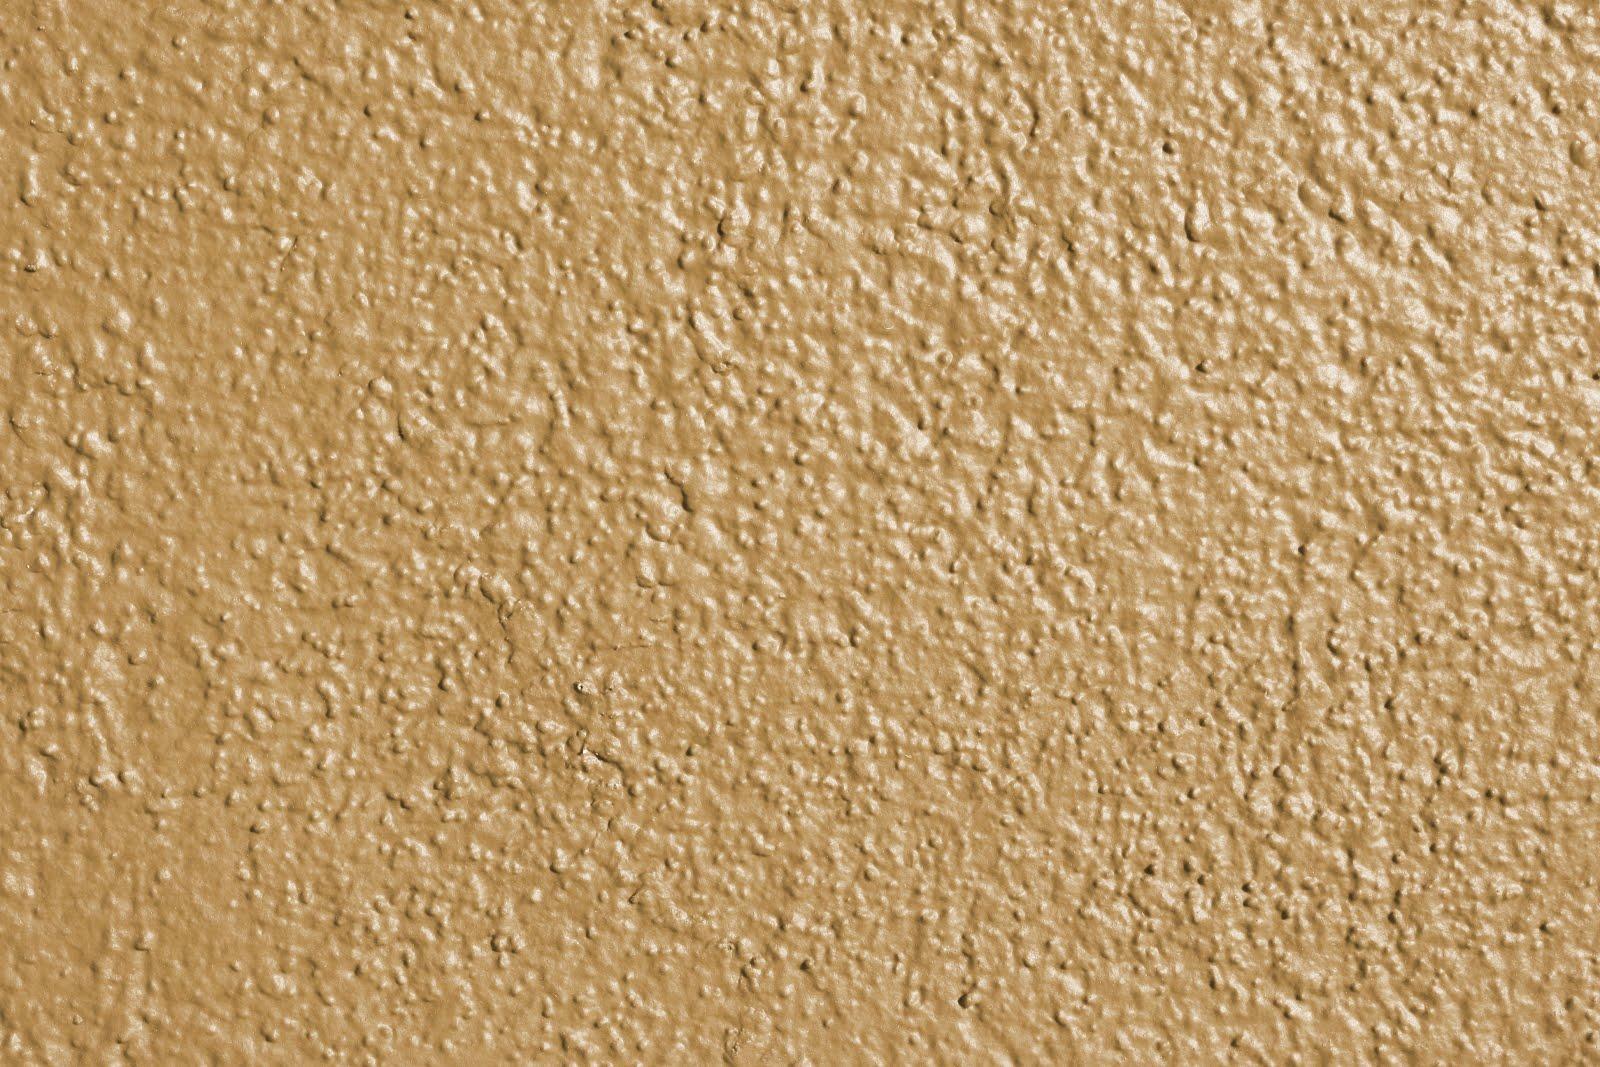 Textured Wallpaper To Paint   Textured Wallpaper 1600x1067